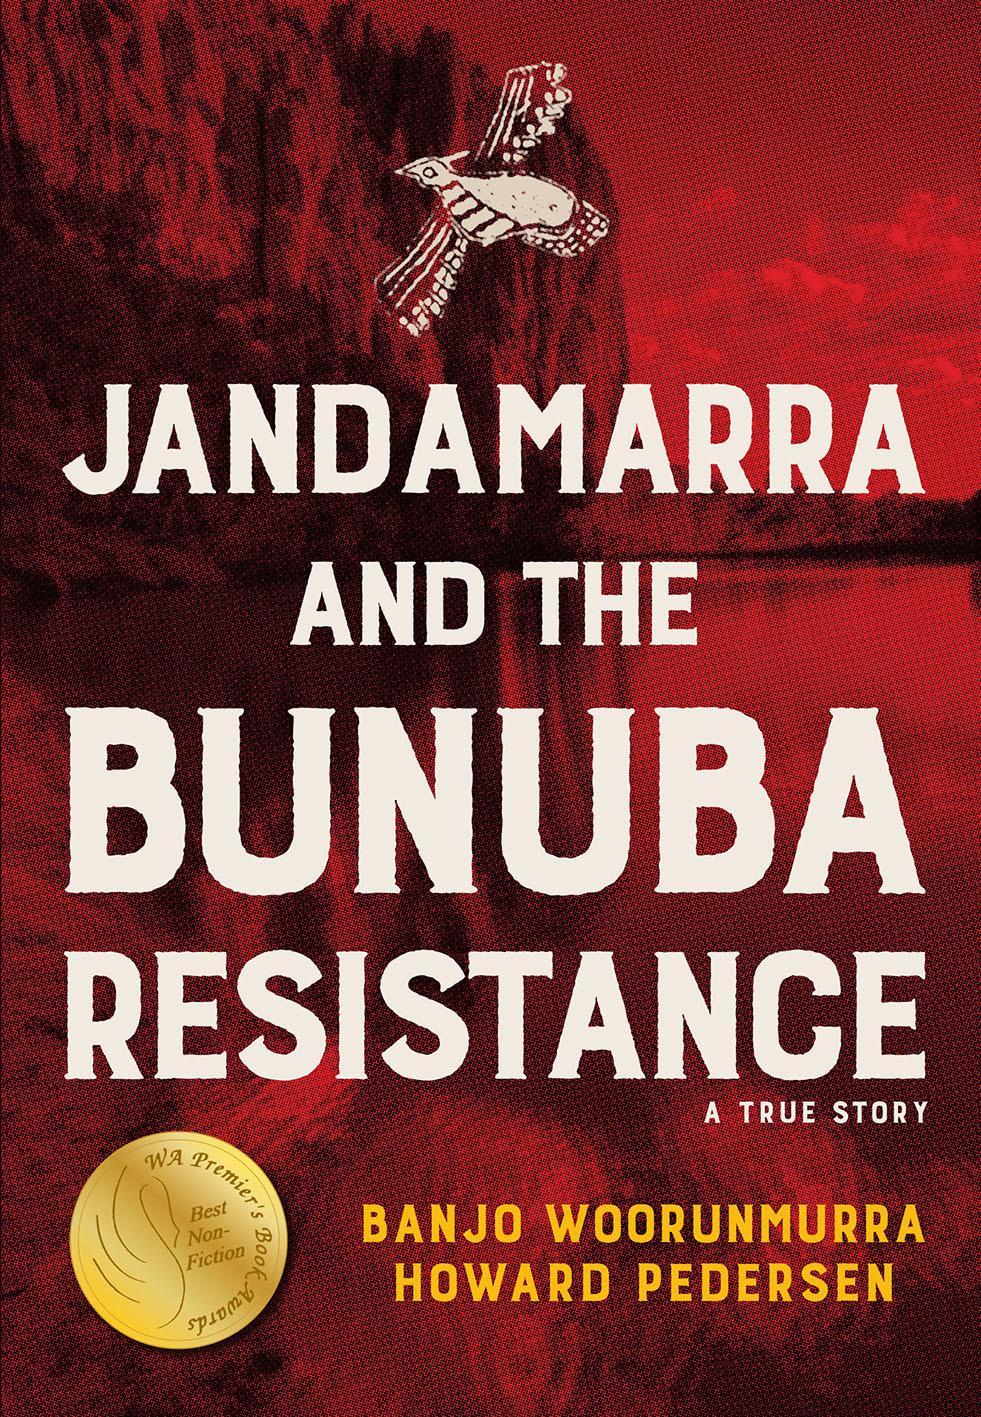 Jandamarra and the Bunuba Resistance: ATrueStory